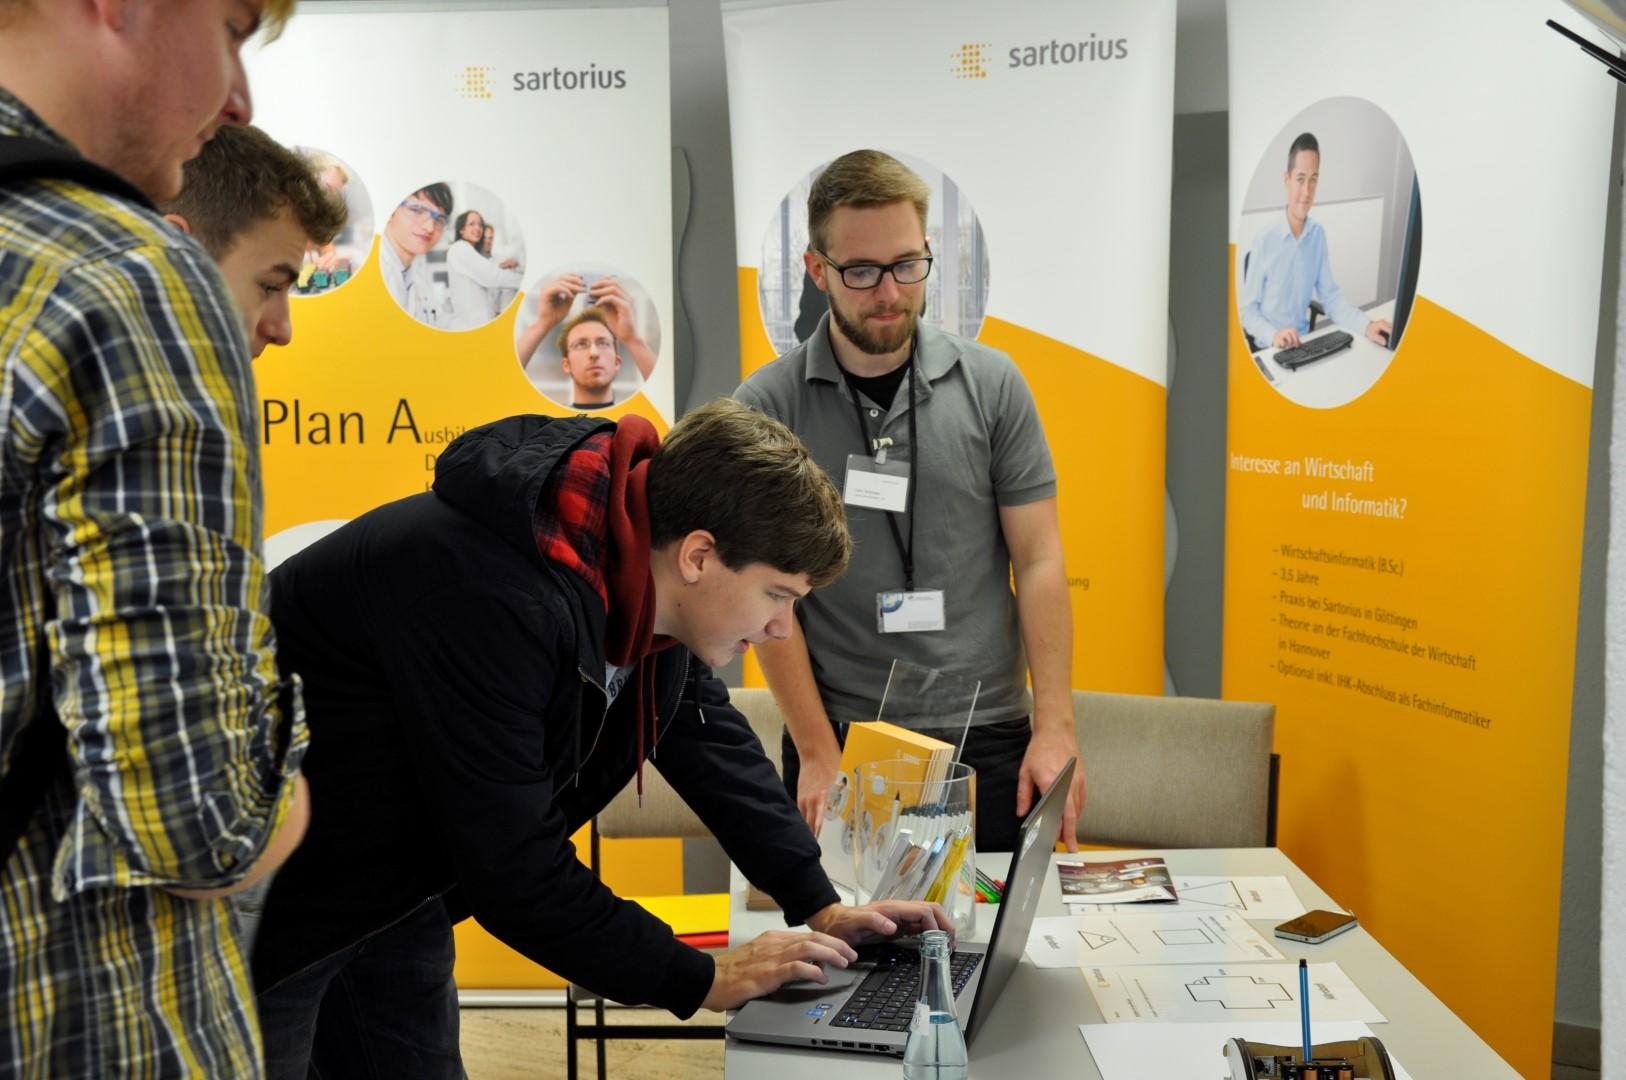 IT-Kongress Göttingen, IT-Ausbildung Göttingen, Know IT